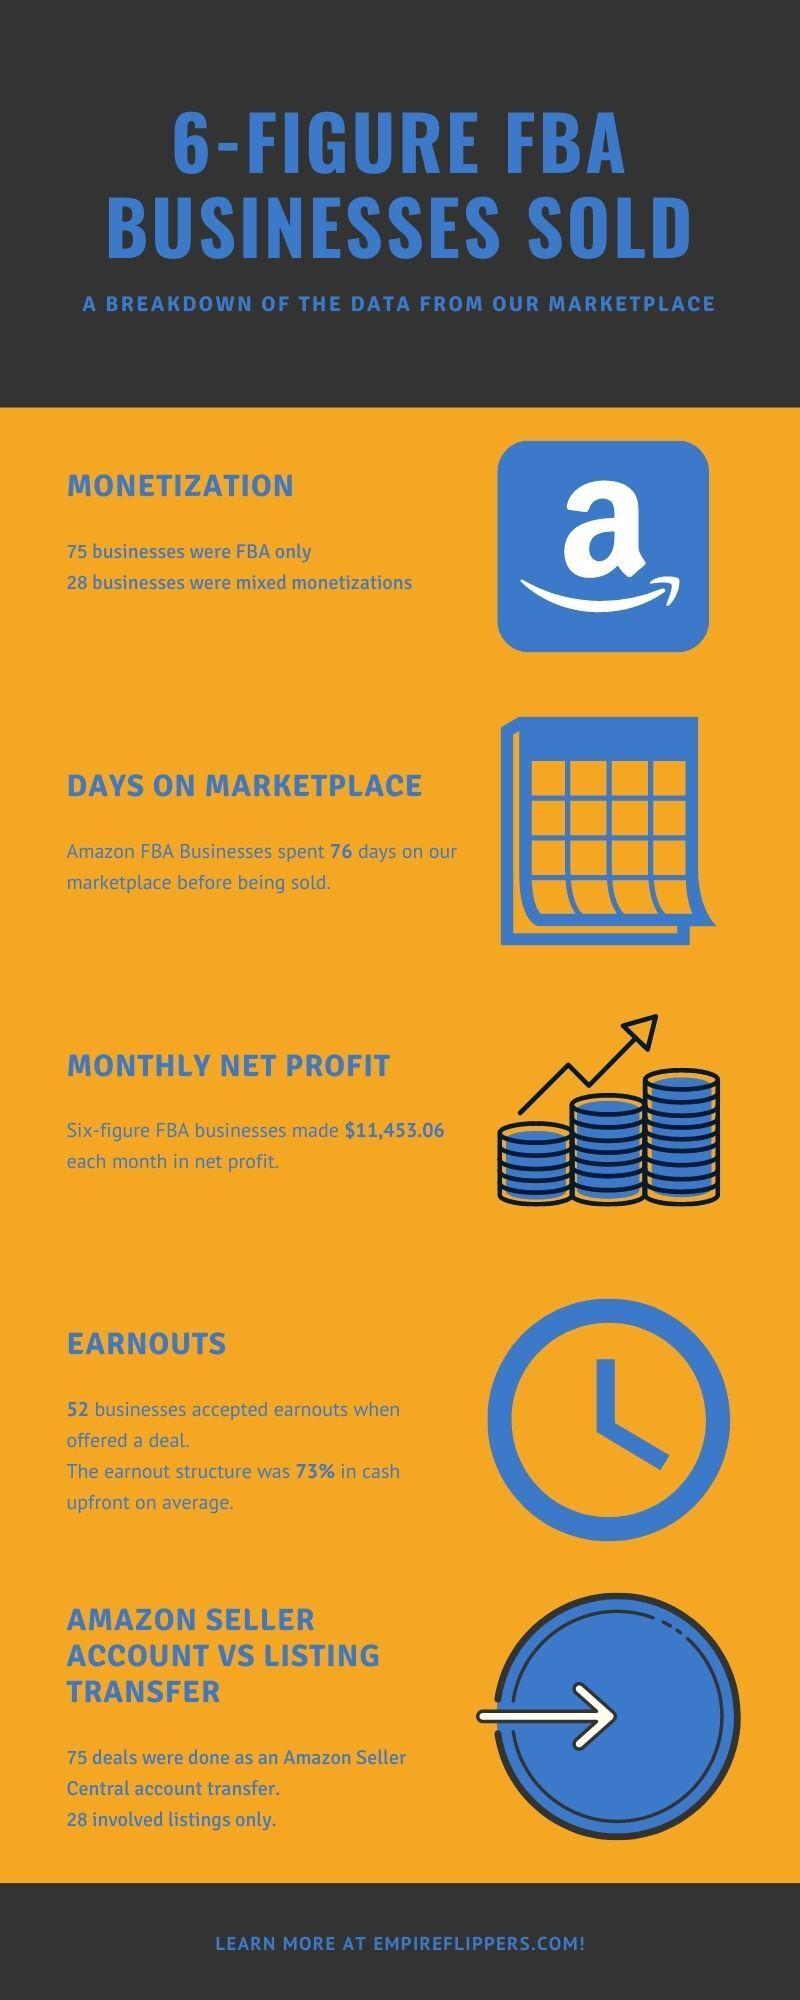 [DRAFT 3] A Data Driven Analysis of Six-Figure Amazon FBA Businesses